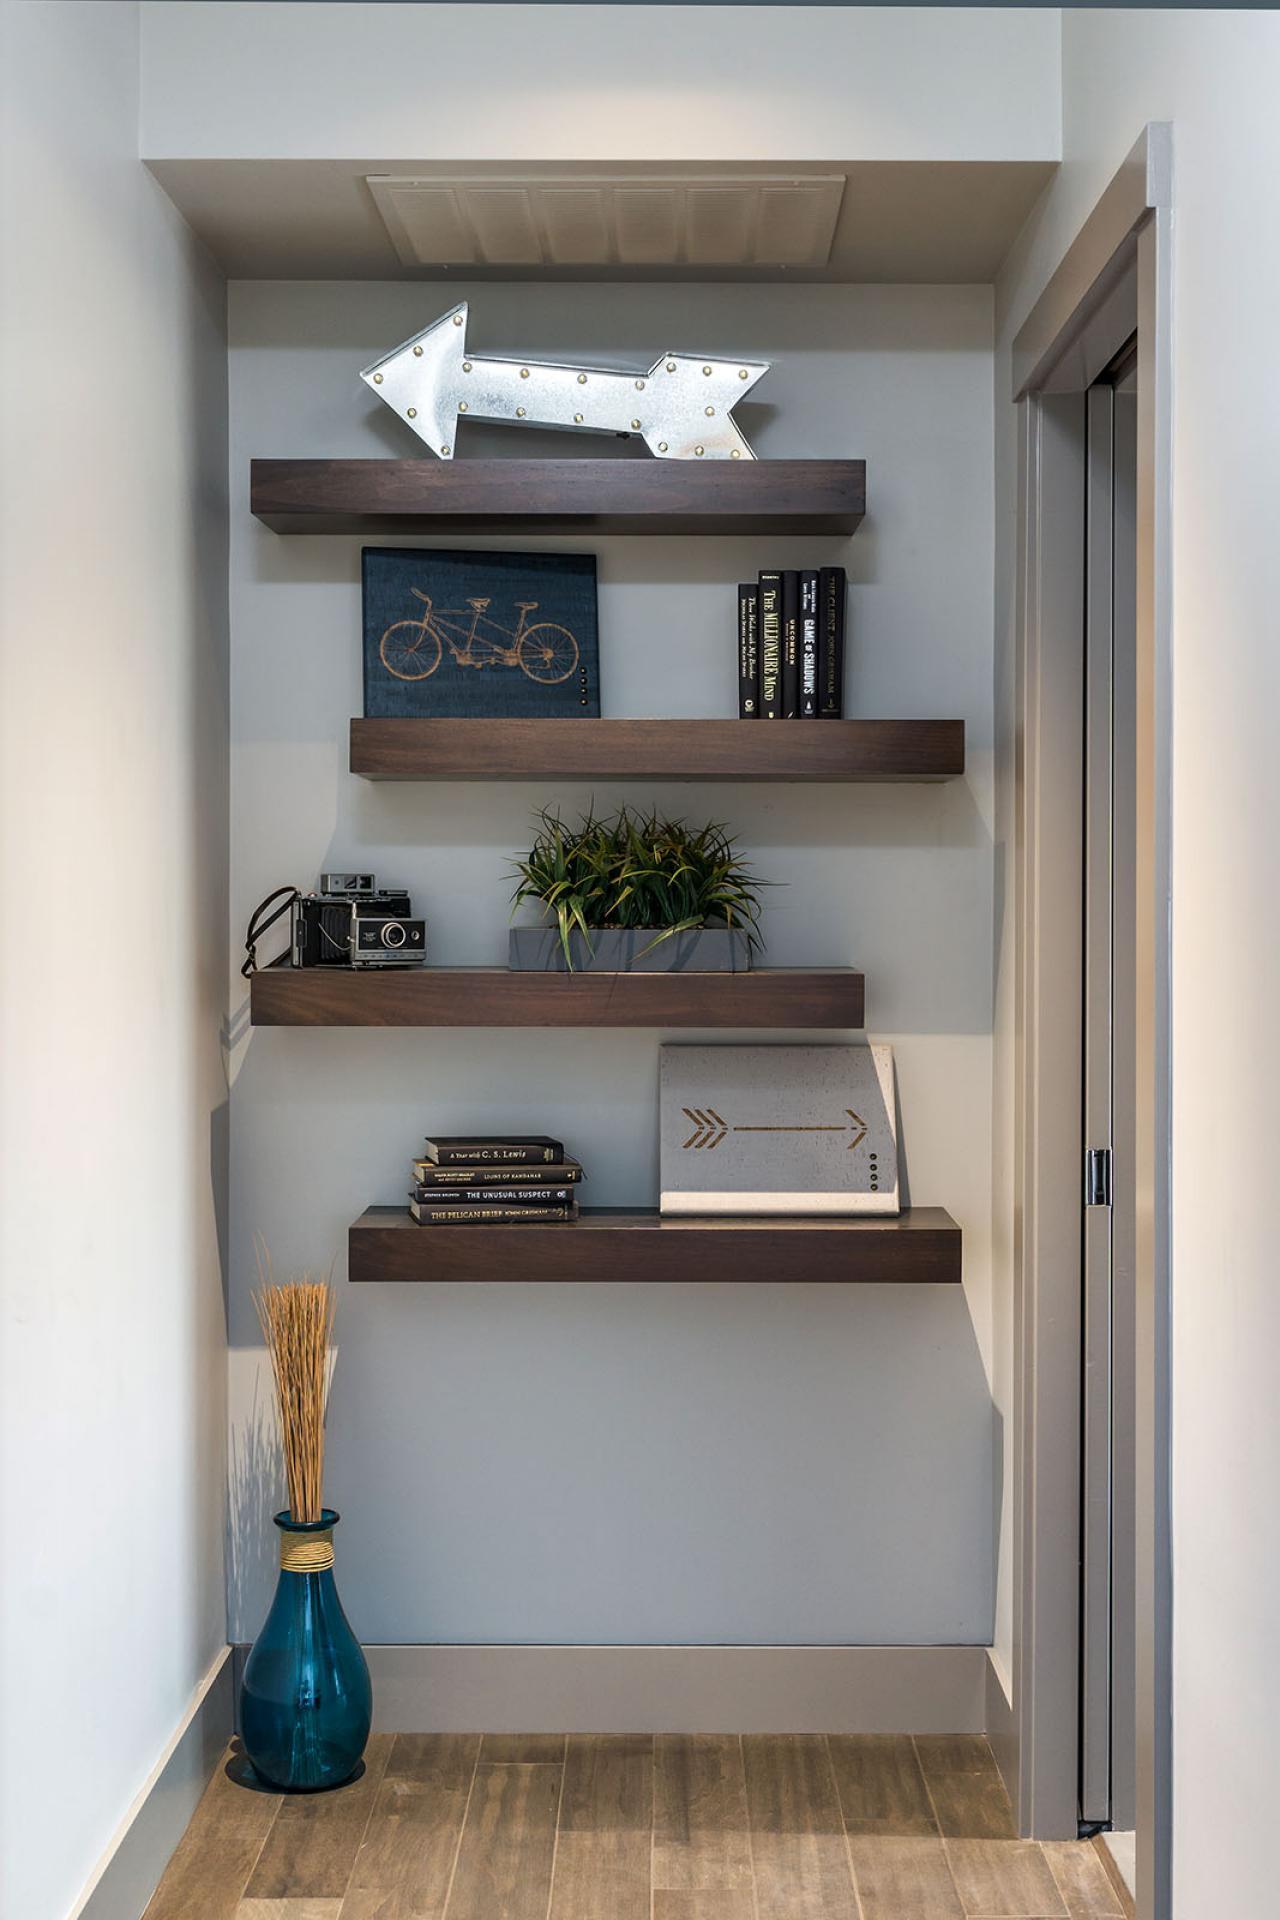 ways decorate with floating shelves decorating master bedroom decorative contemporary hallway folding shelf support hinge entryway hall tree storage hearth fireplace brushed